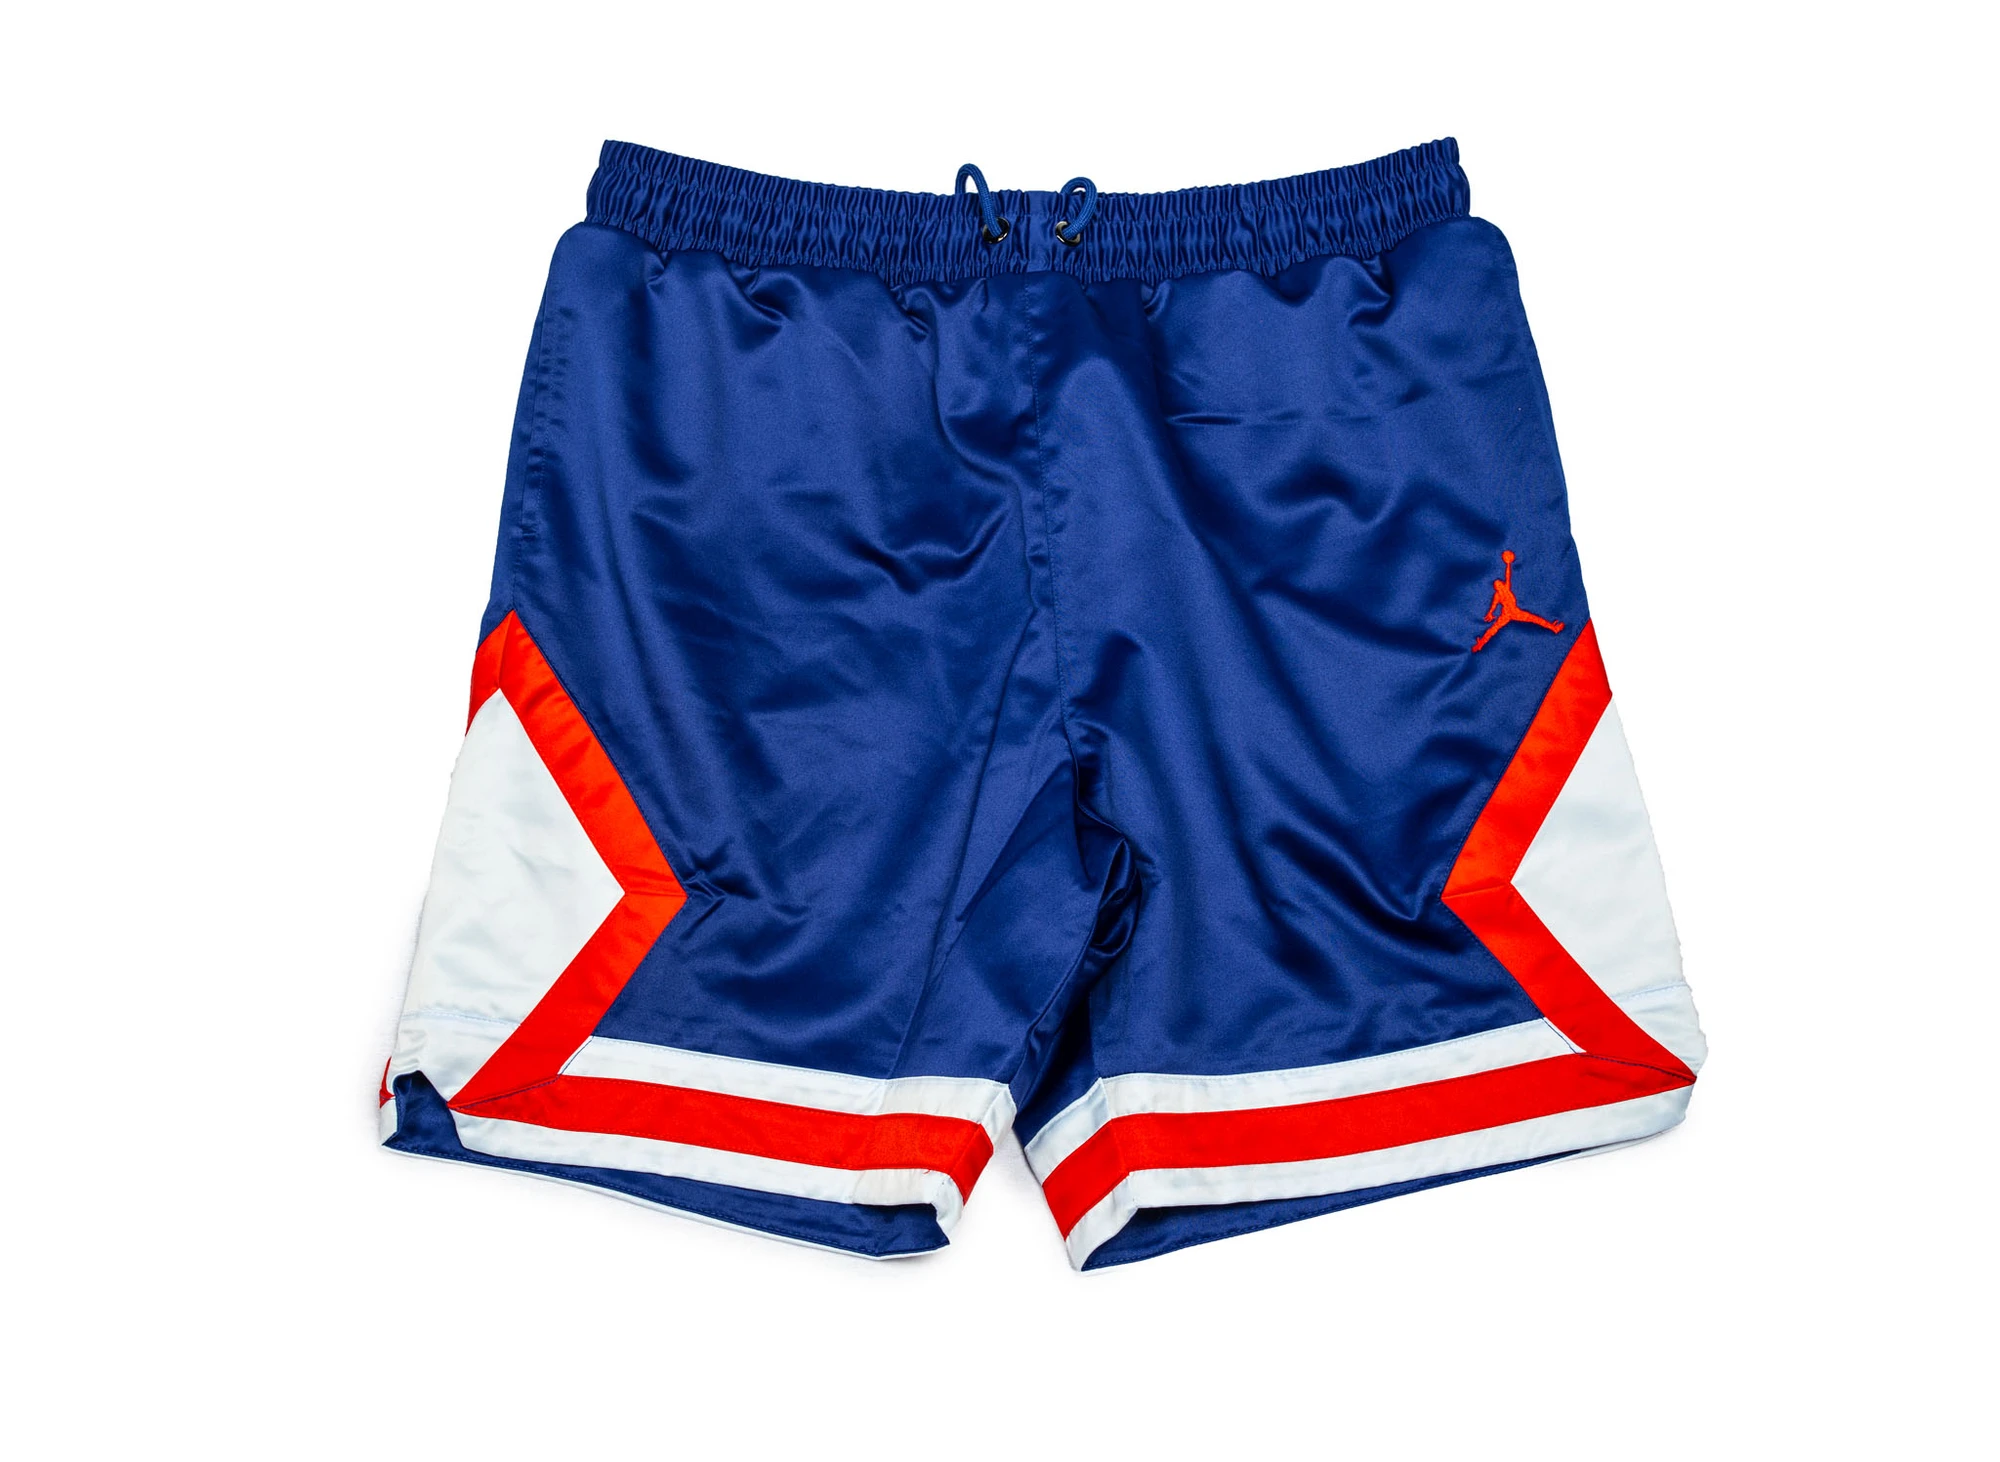 OFF the Air Jordan Satin Diamond Shorts